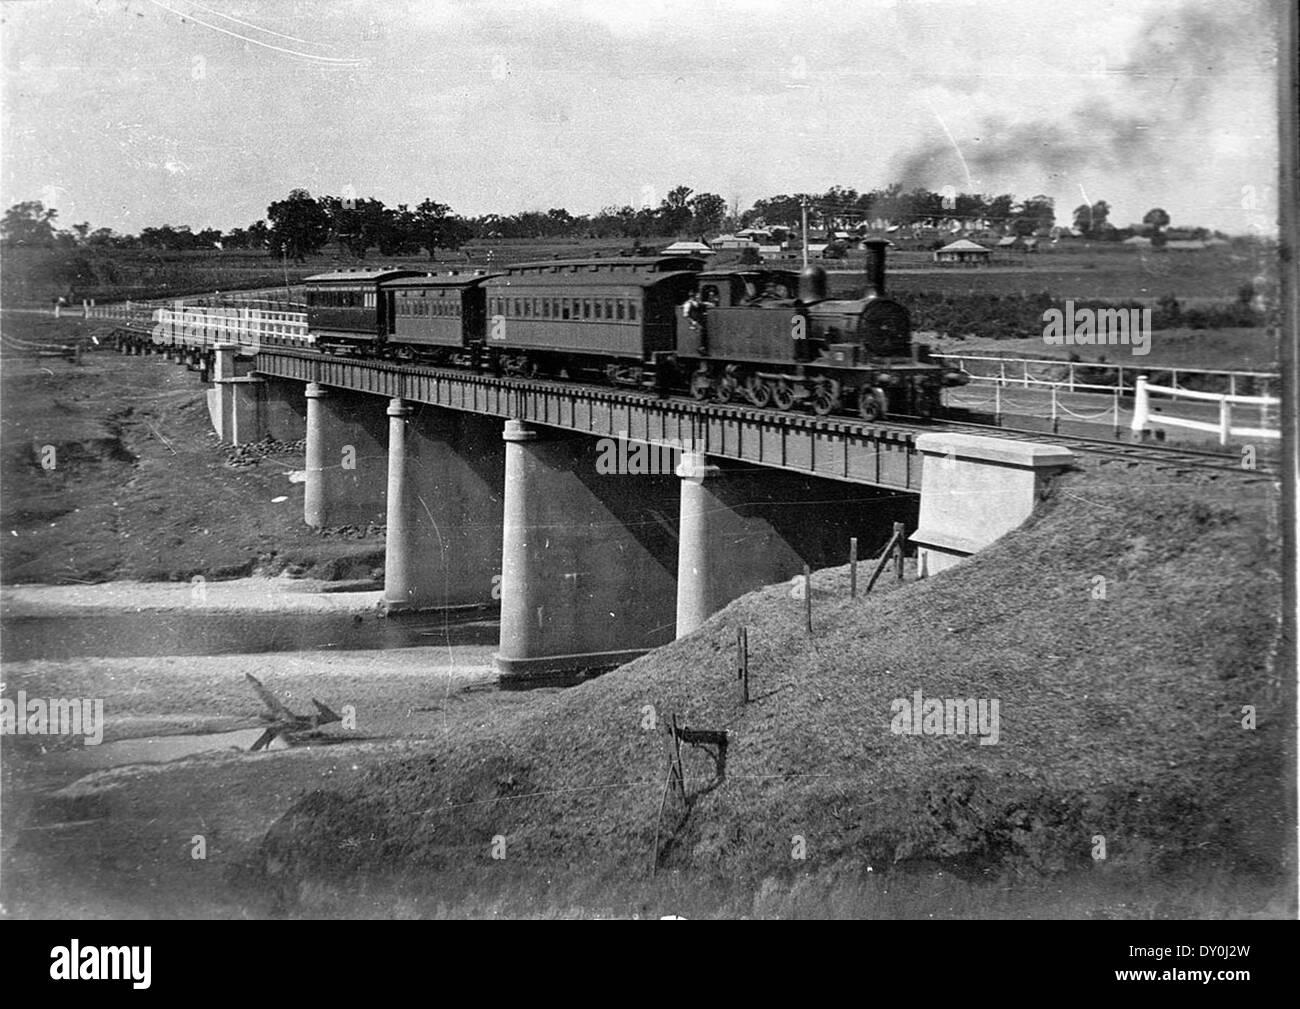 20 class tank engine and suburban passenger train, Camden, ca. 1930 / photographer unknown - Stock Image